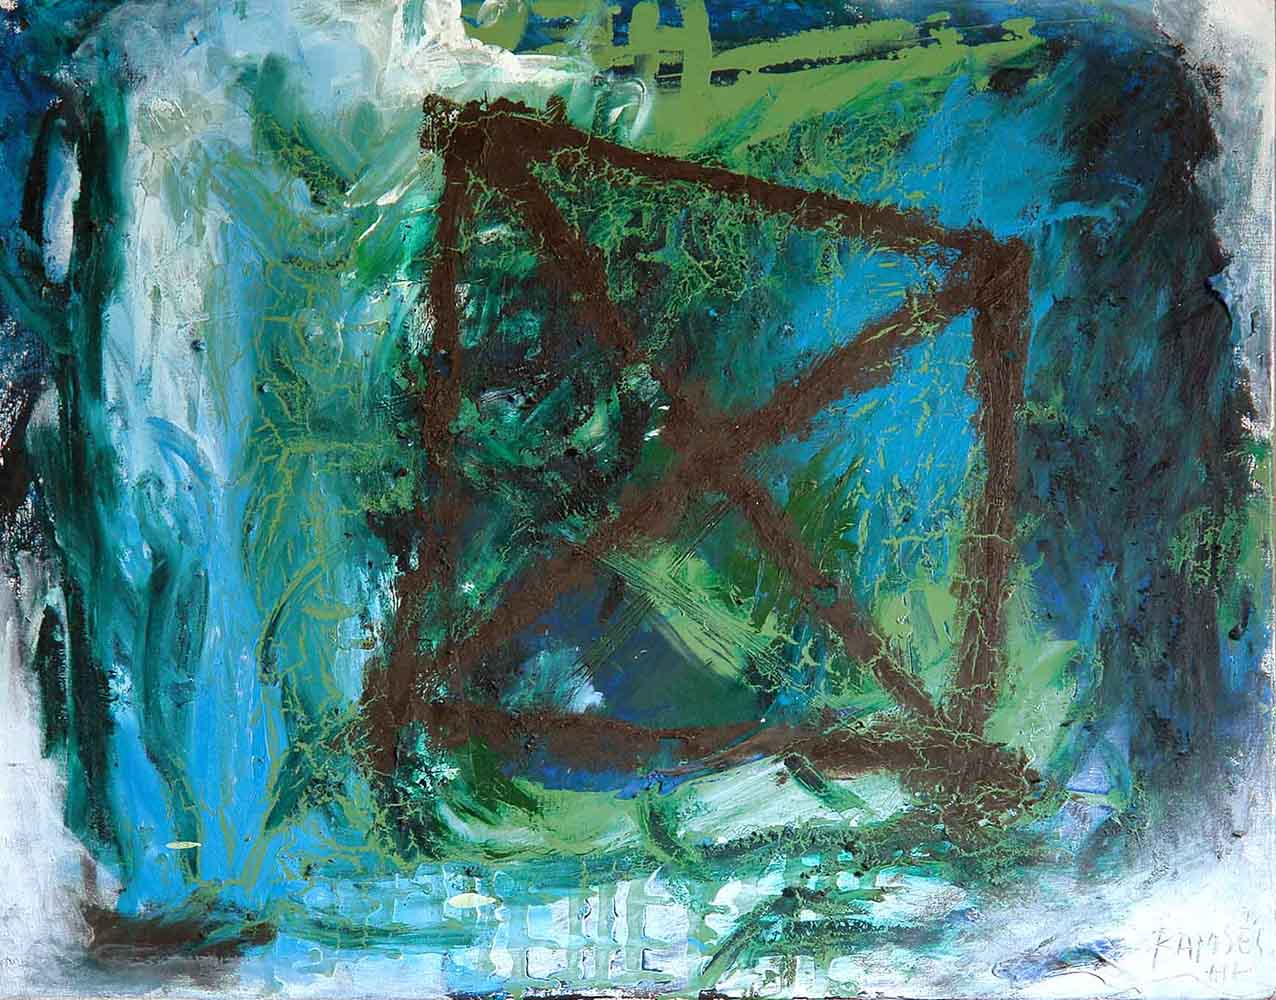 Abstract33 Ramses Morales